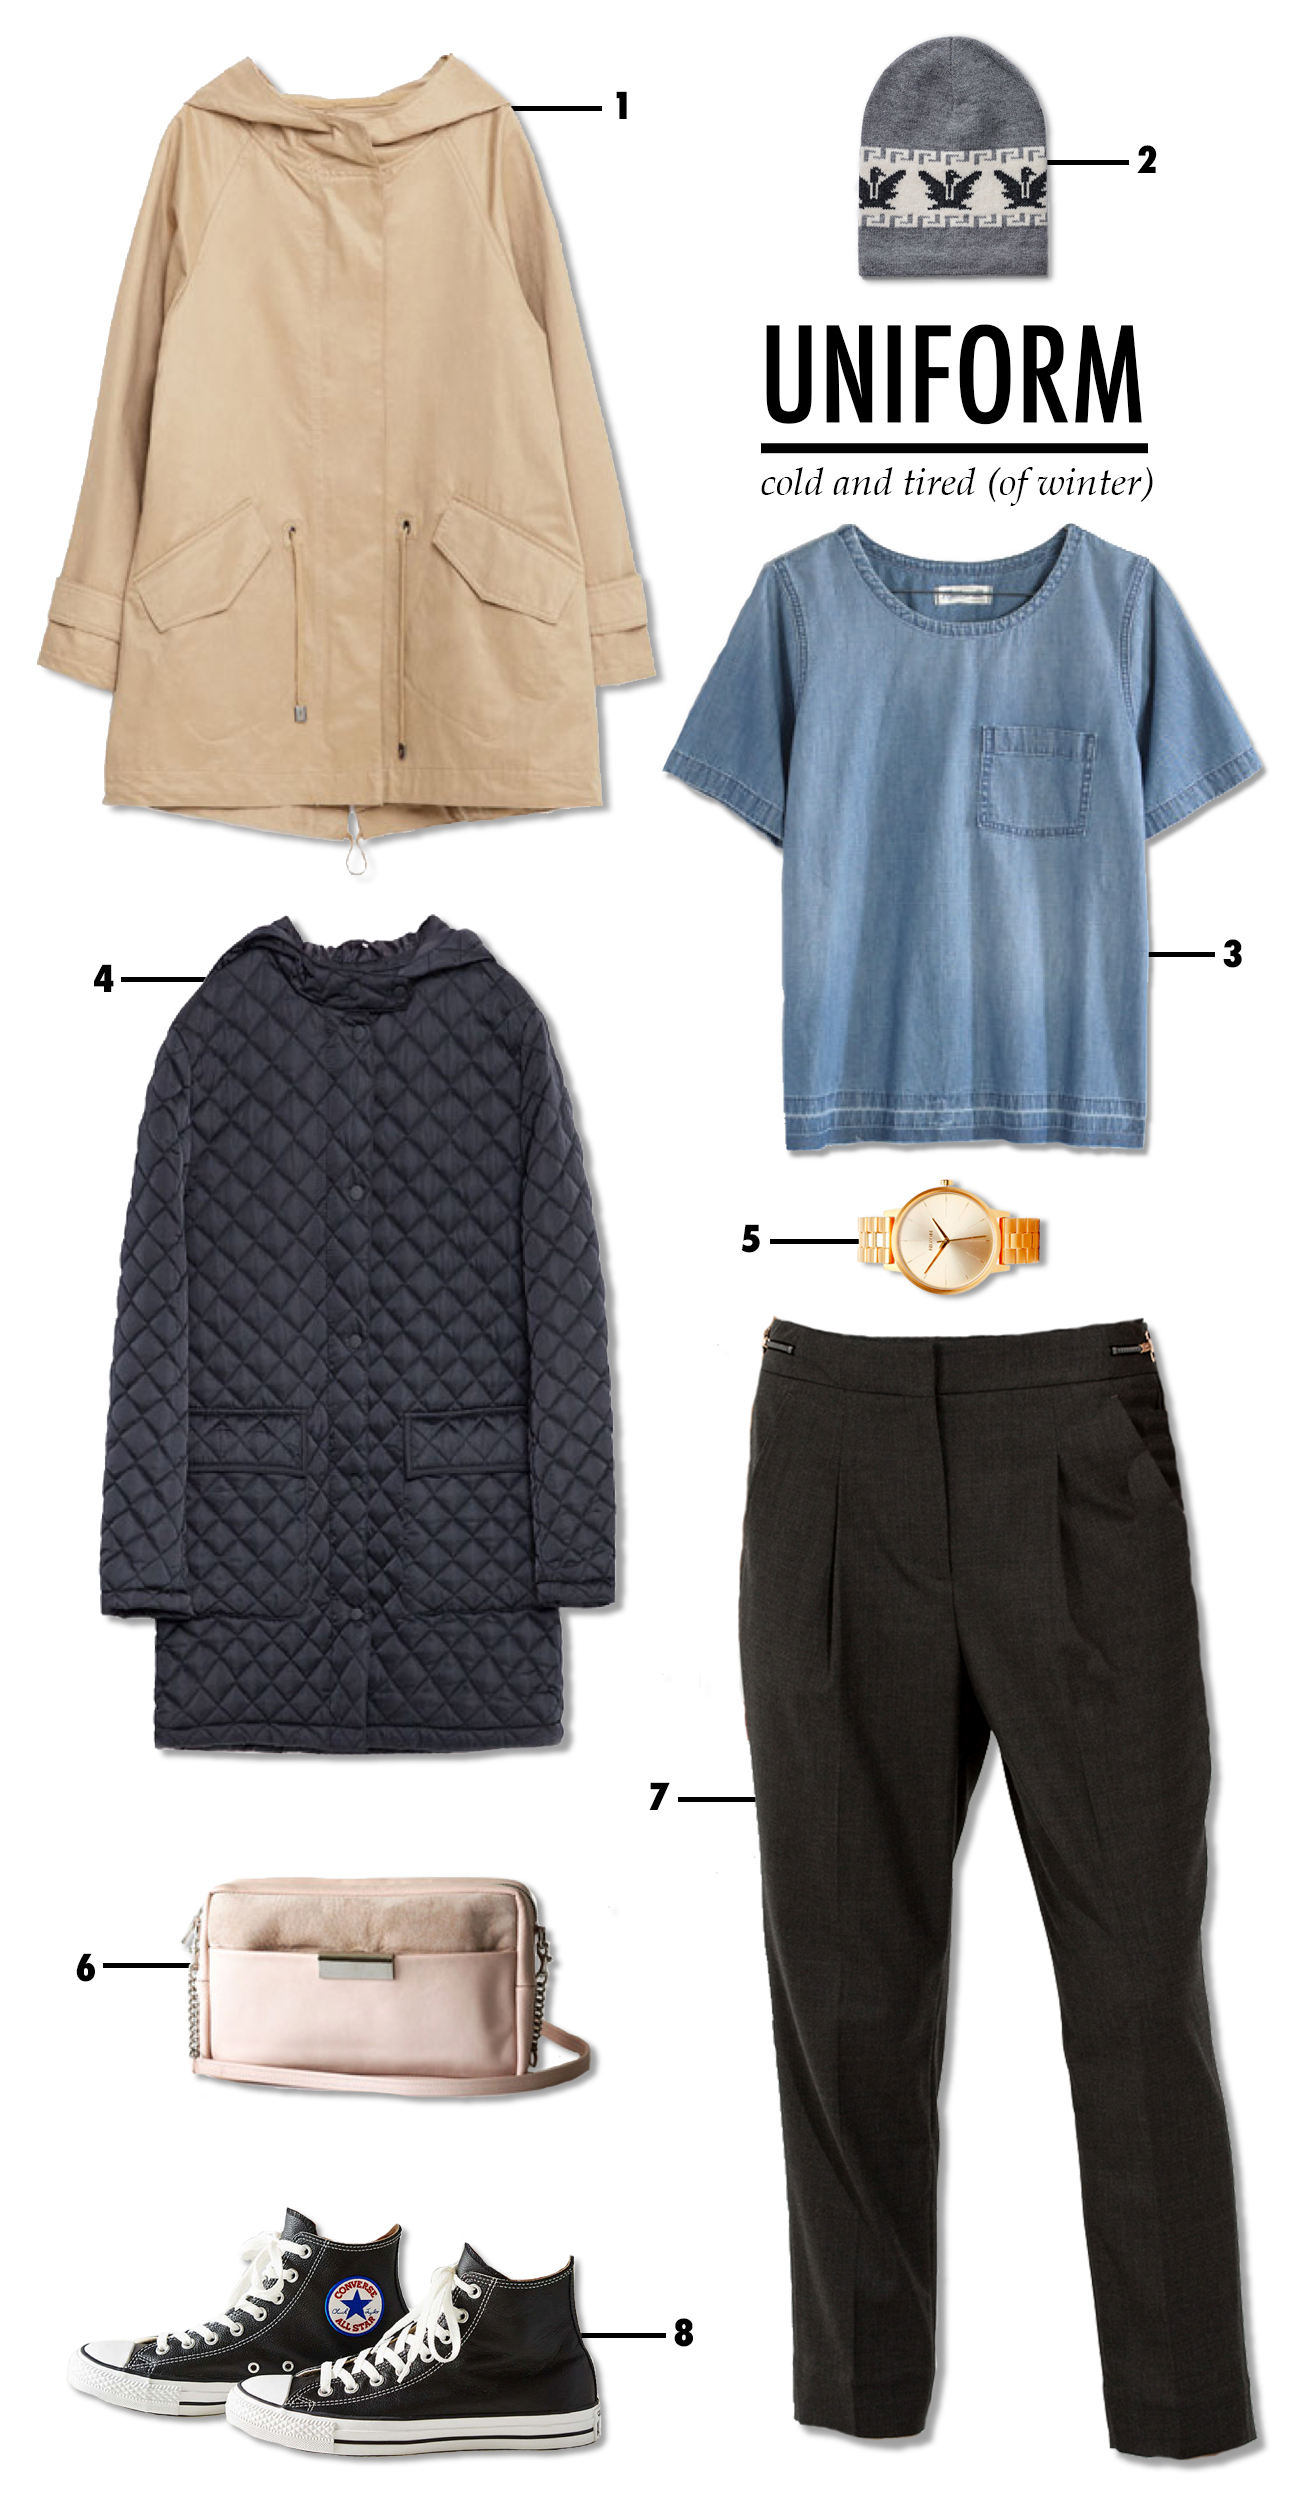 uniform #style